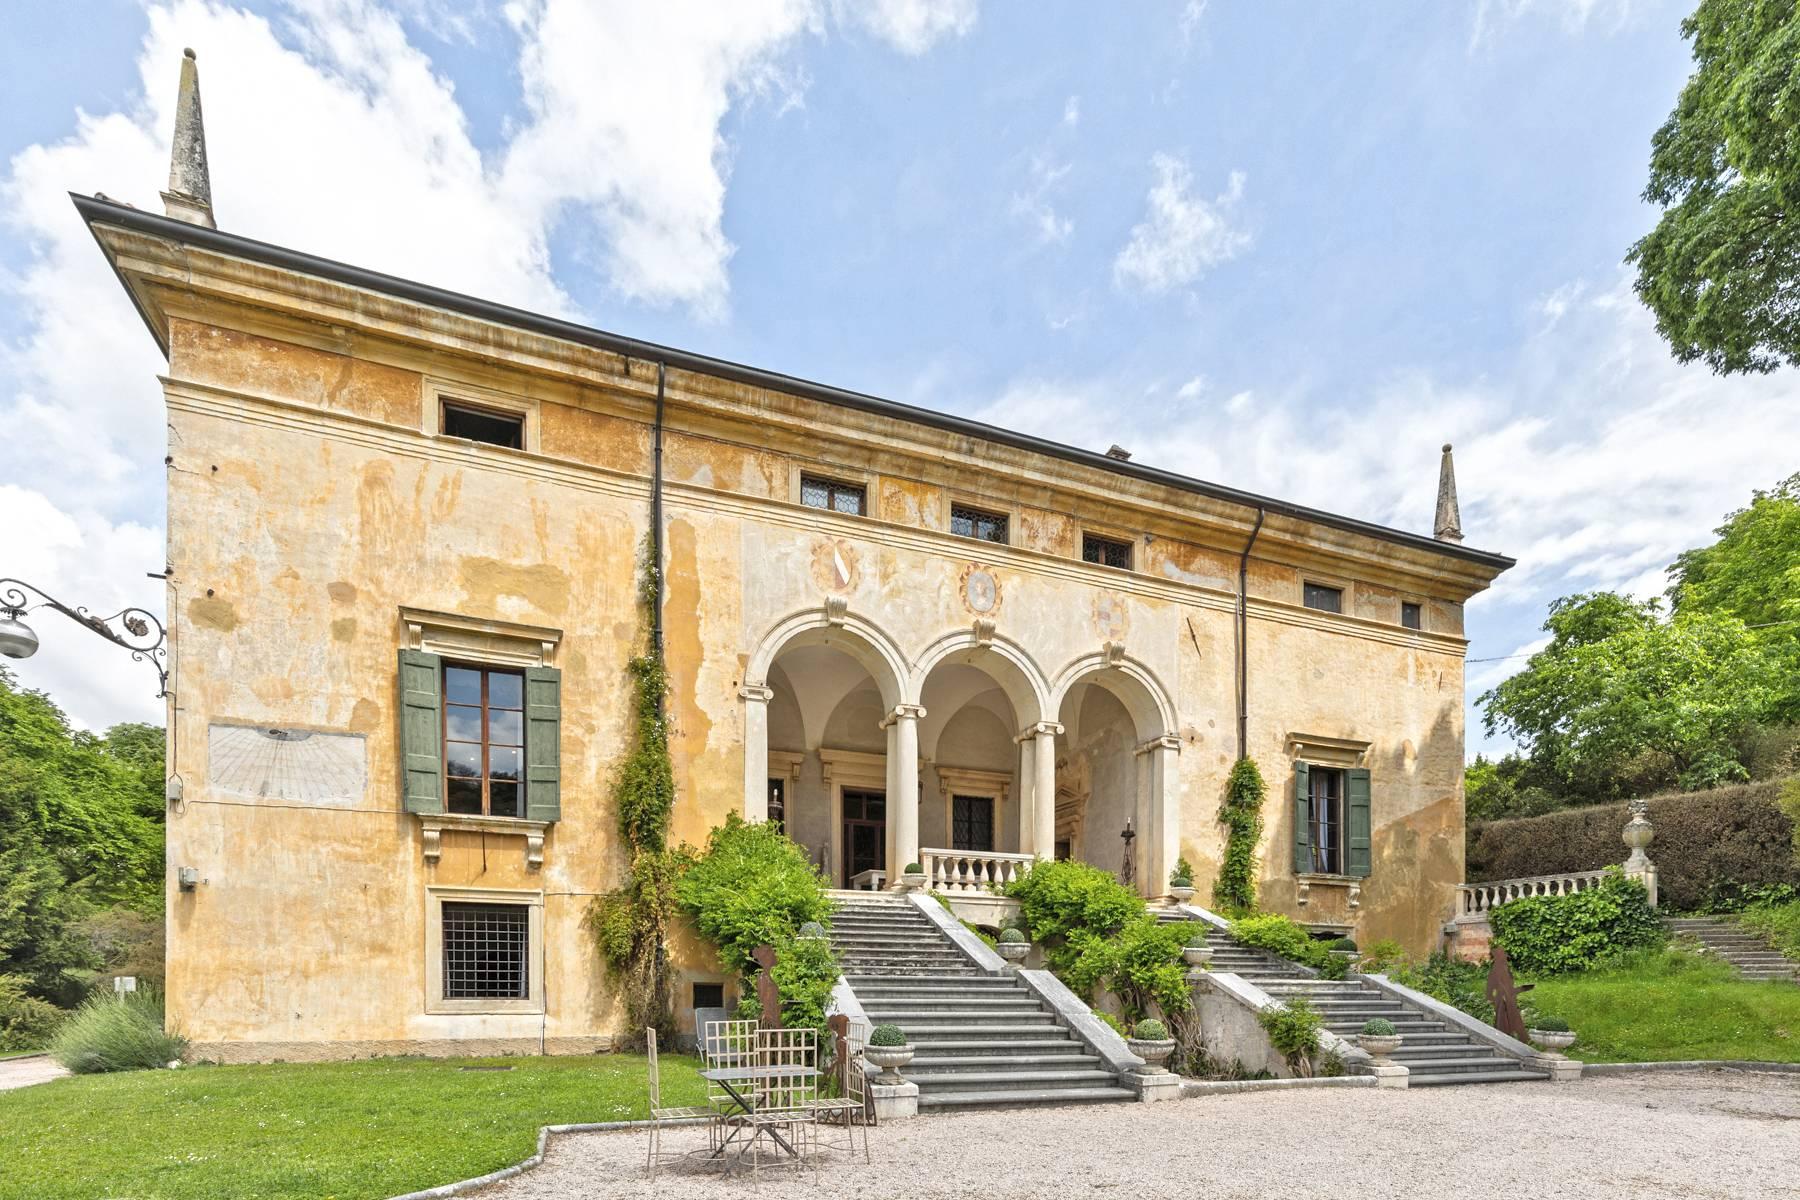 Villa in Vendita a Verona: 5 locali, 2400 mq - Foto 9